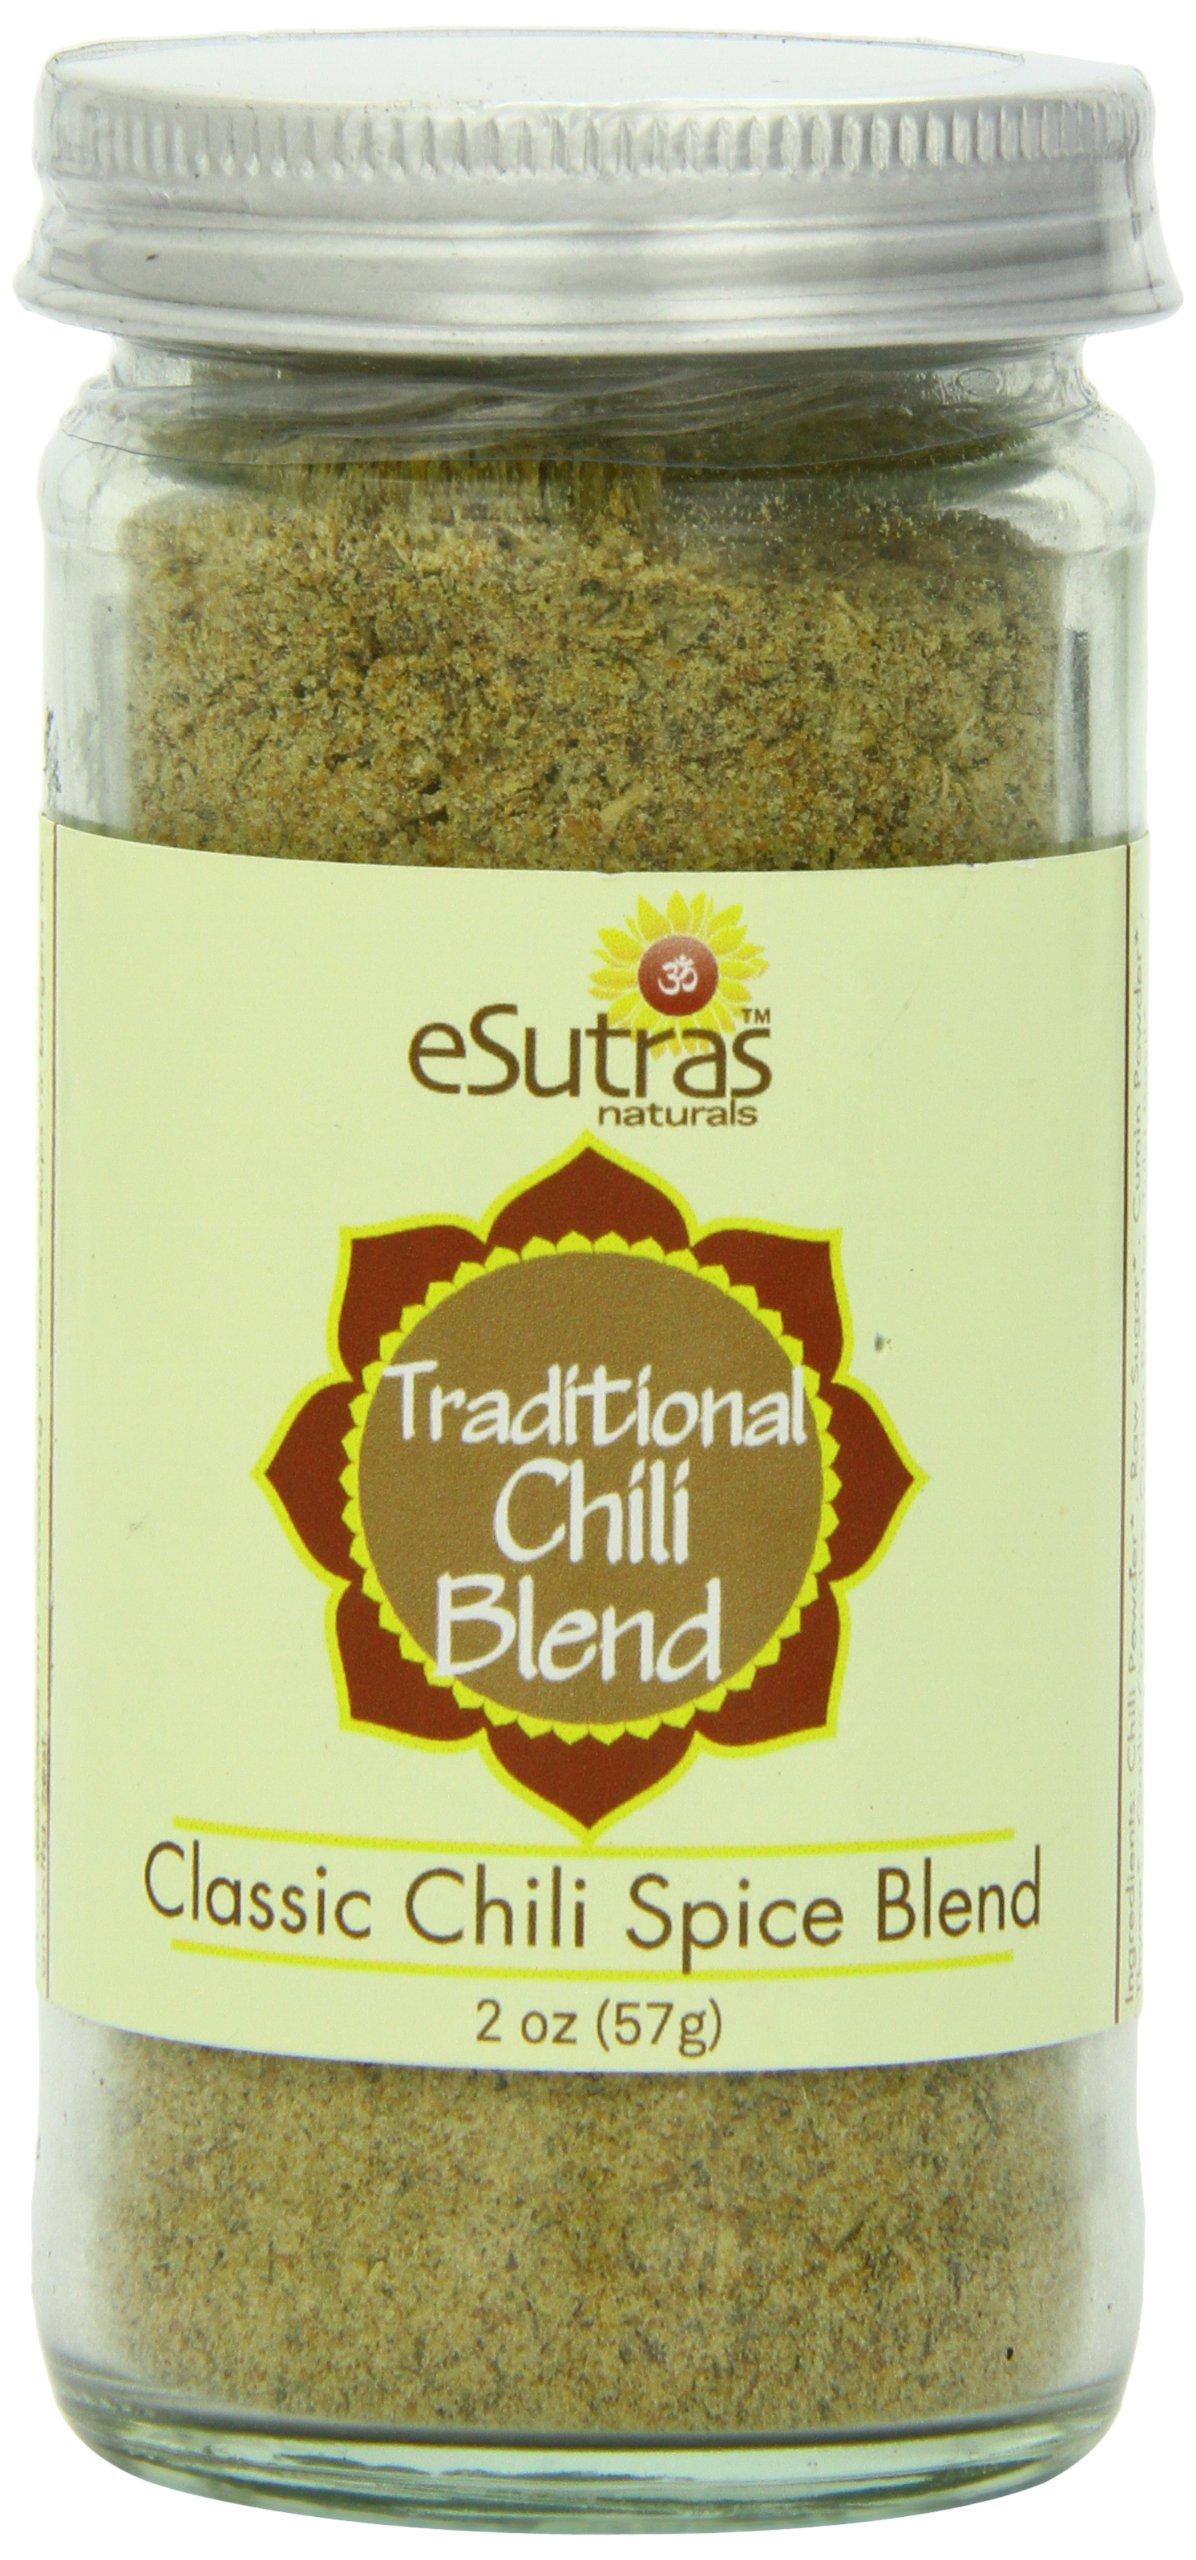 Esutras Organics Traditional Chili Blend, 2 Ounce